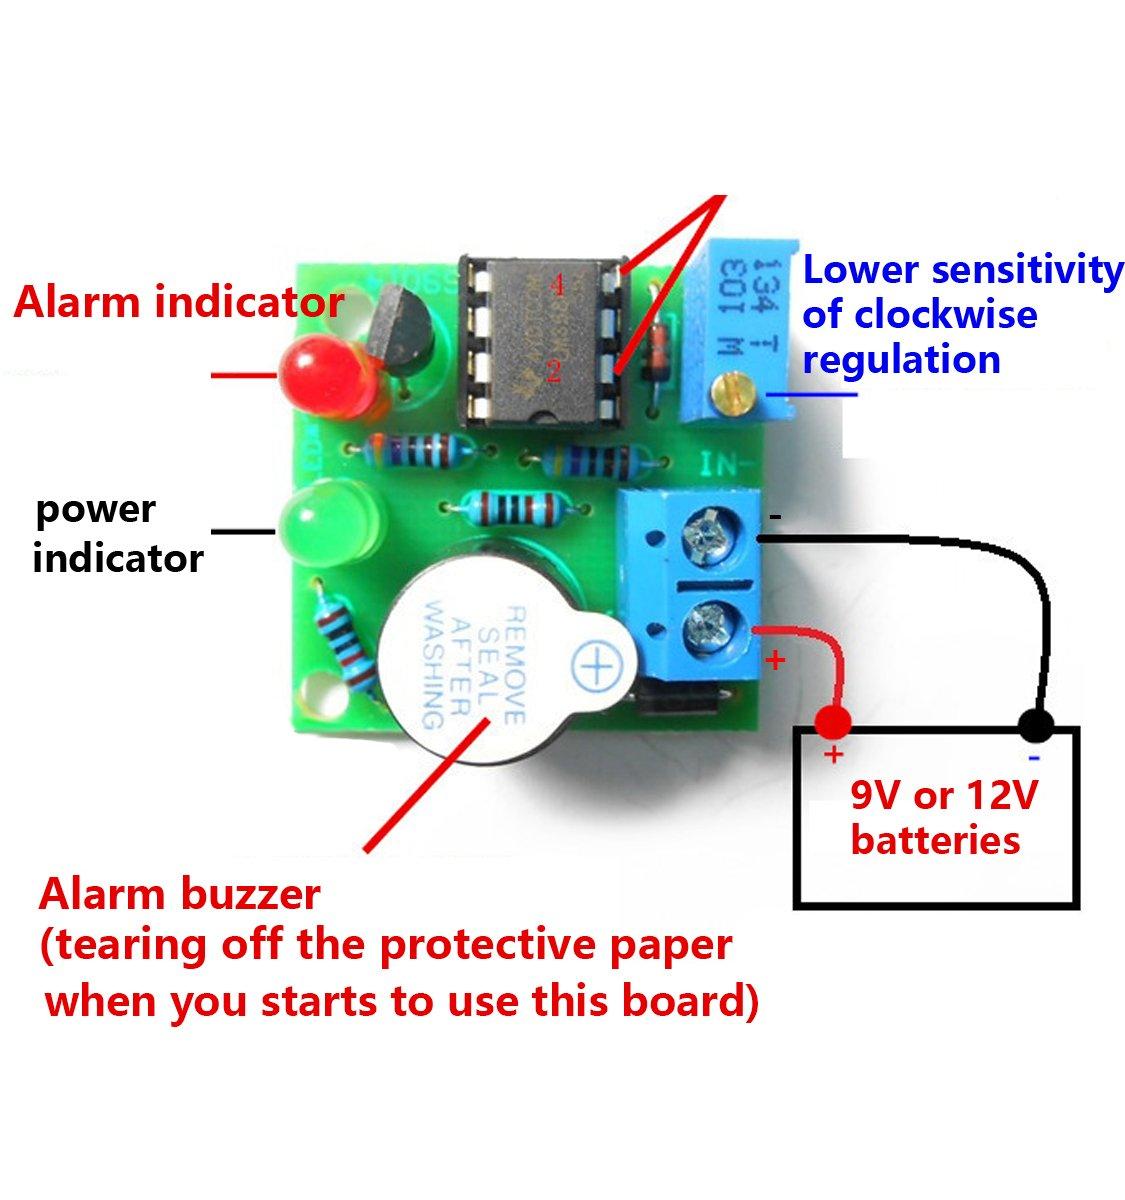 12v Lead Acid Battery Overdischarge Sound Light Alarm Protection 9 Volt Buzzer Circuit Diagram Board Low Voltage Warner